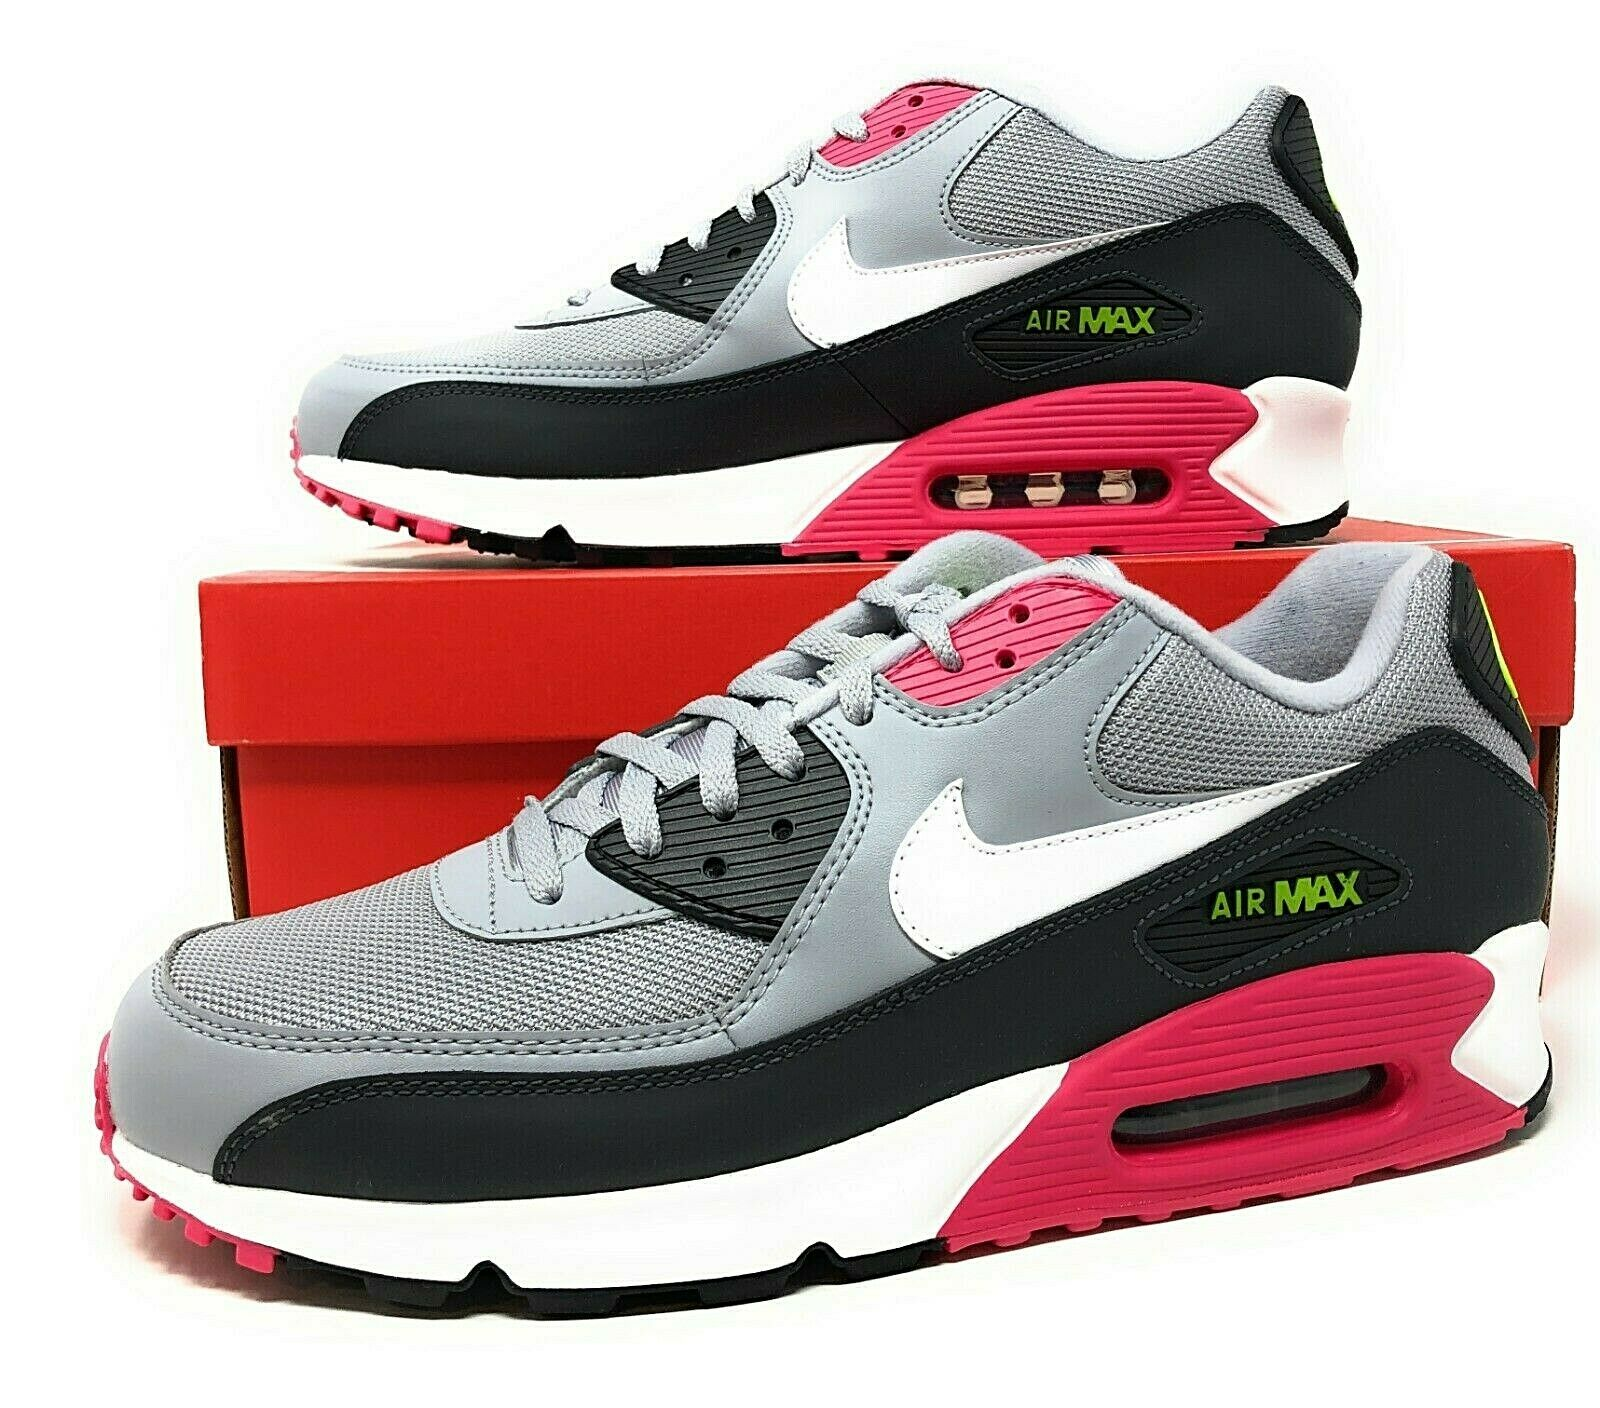 Nike Air Max 90 Essential men's Lifestyle Shoe